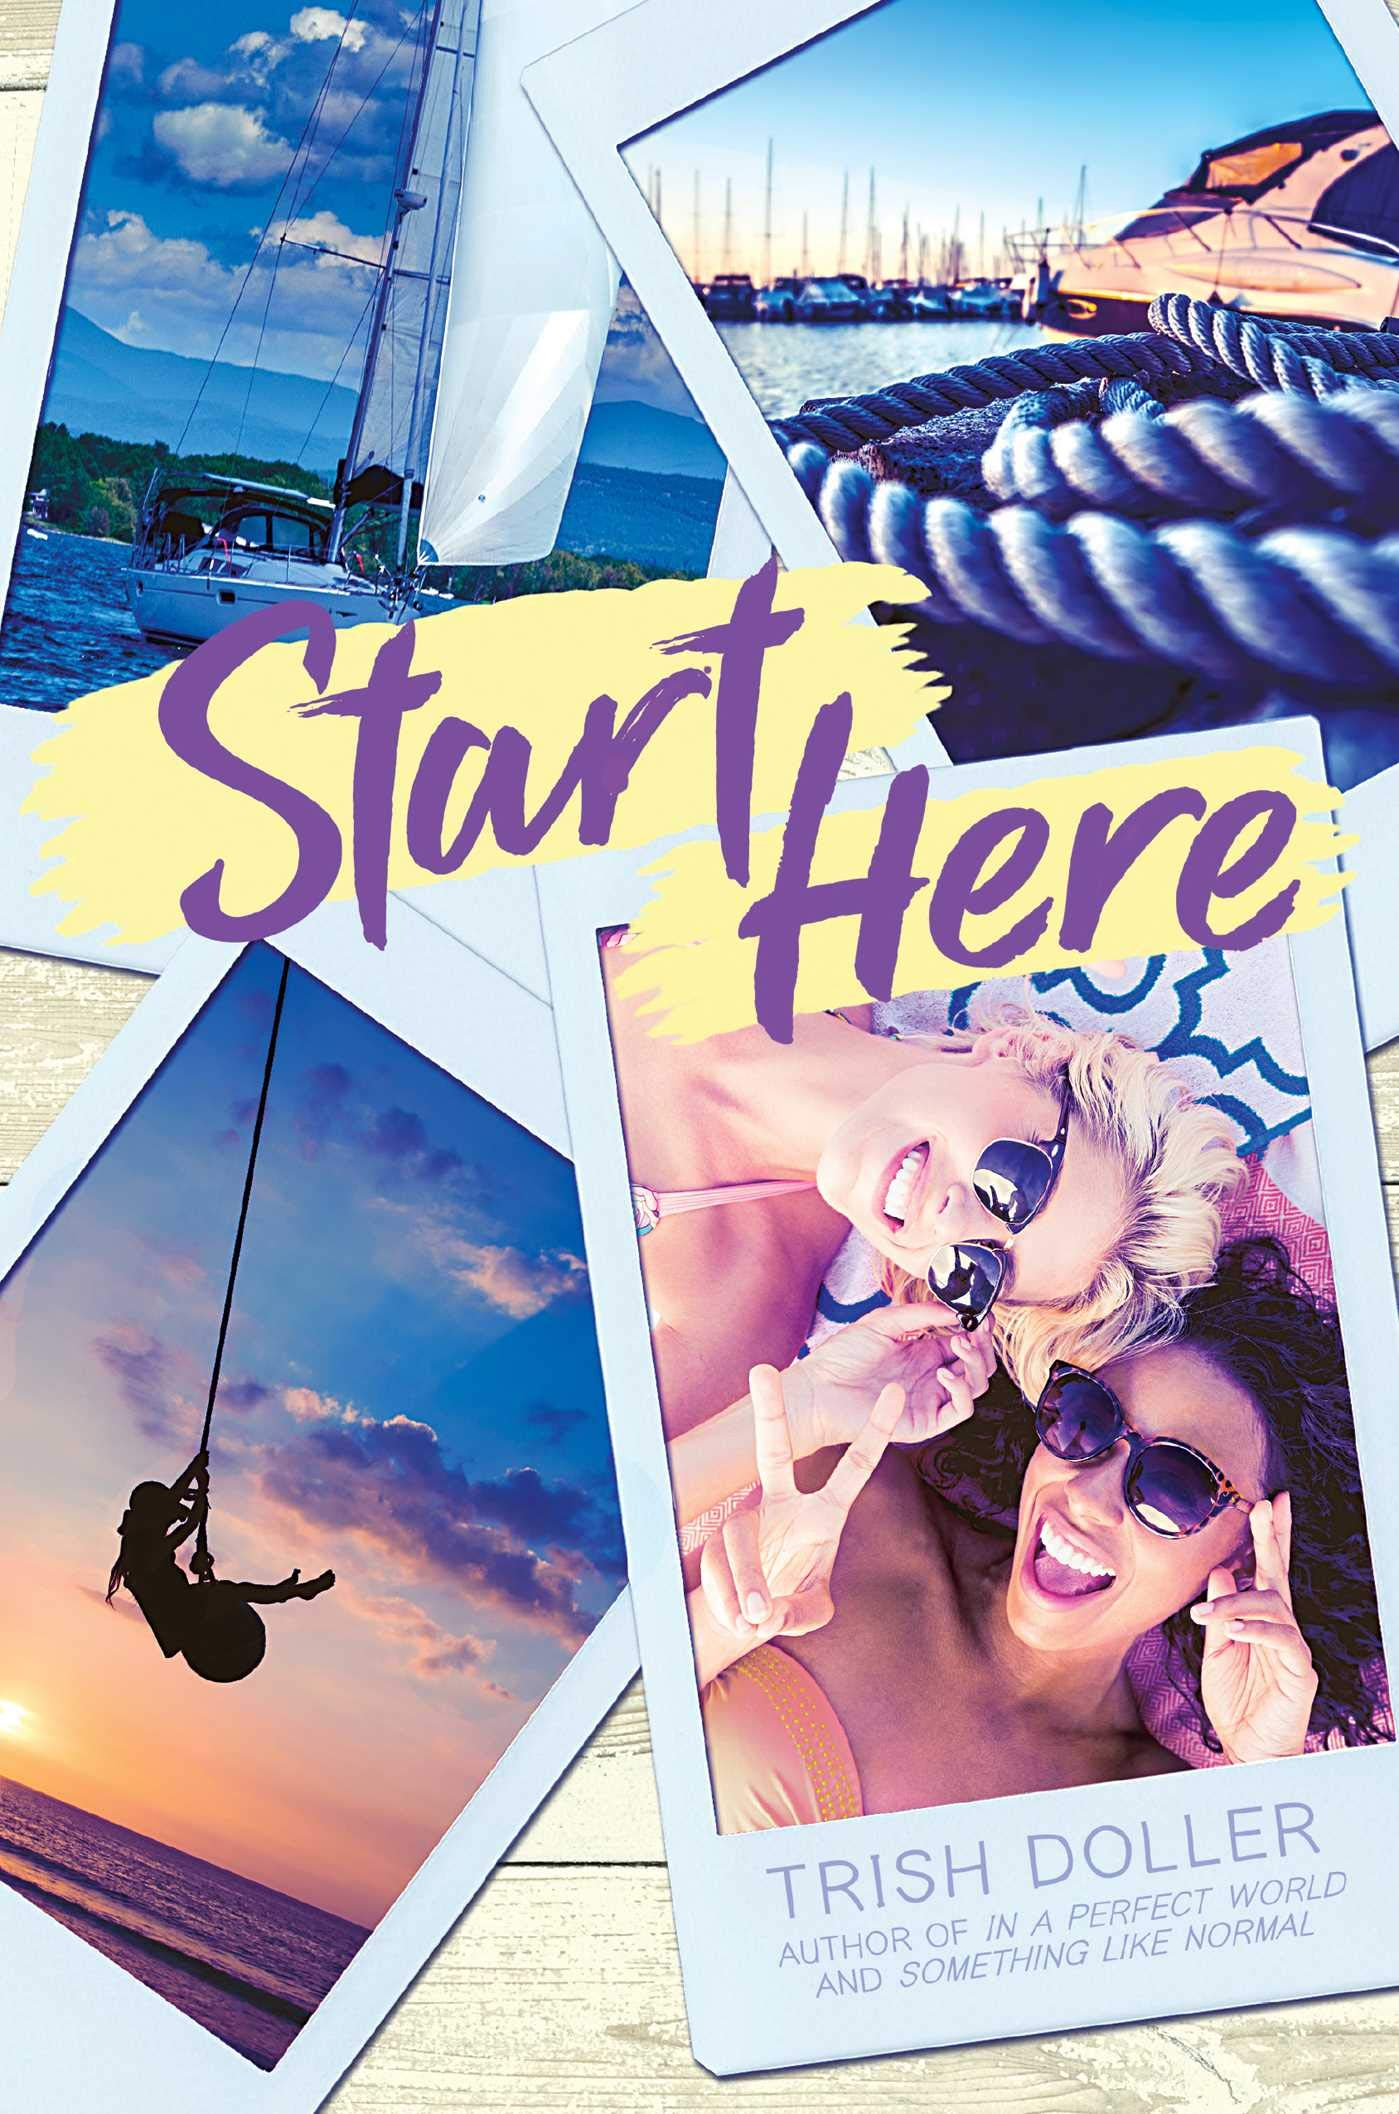 Amazon.com: Start Here (9781481479912): Doller, Trish: Books